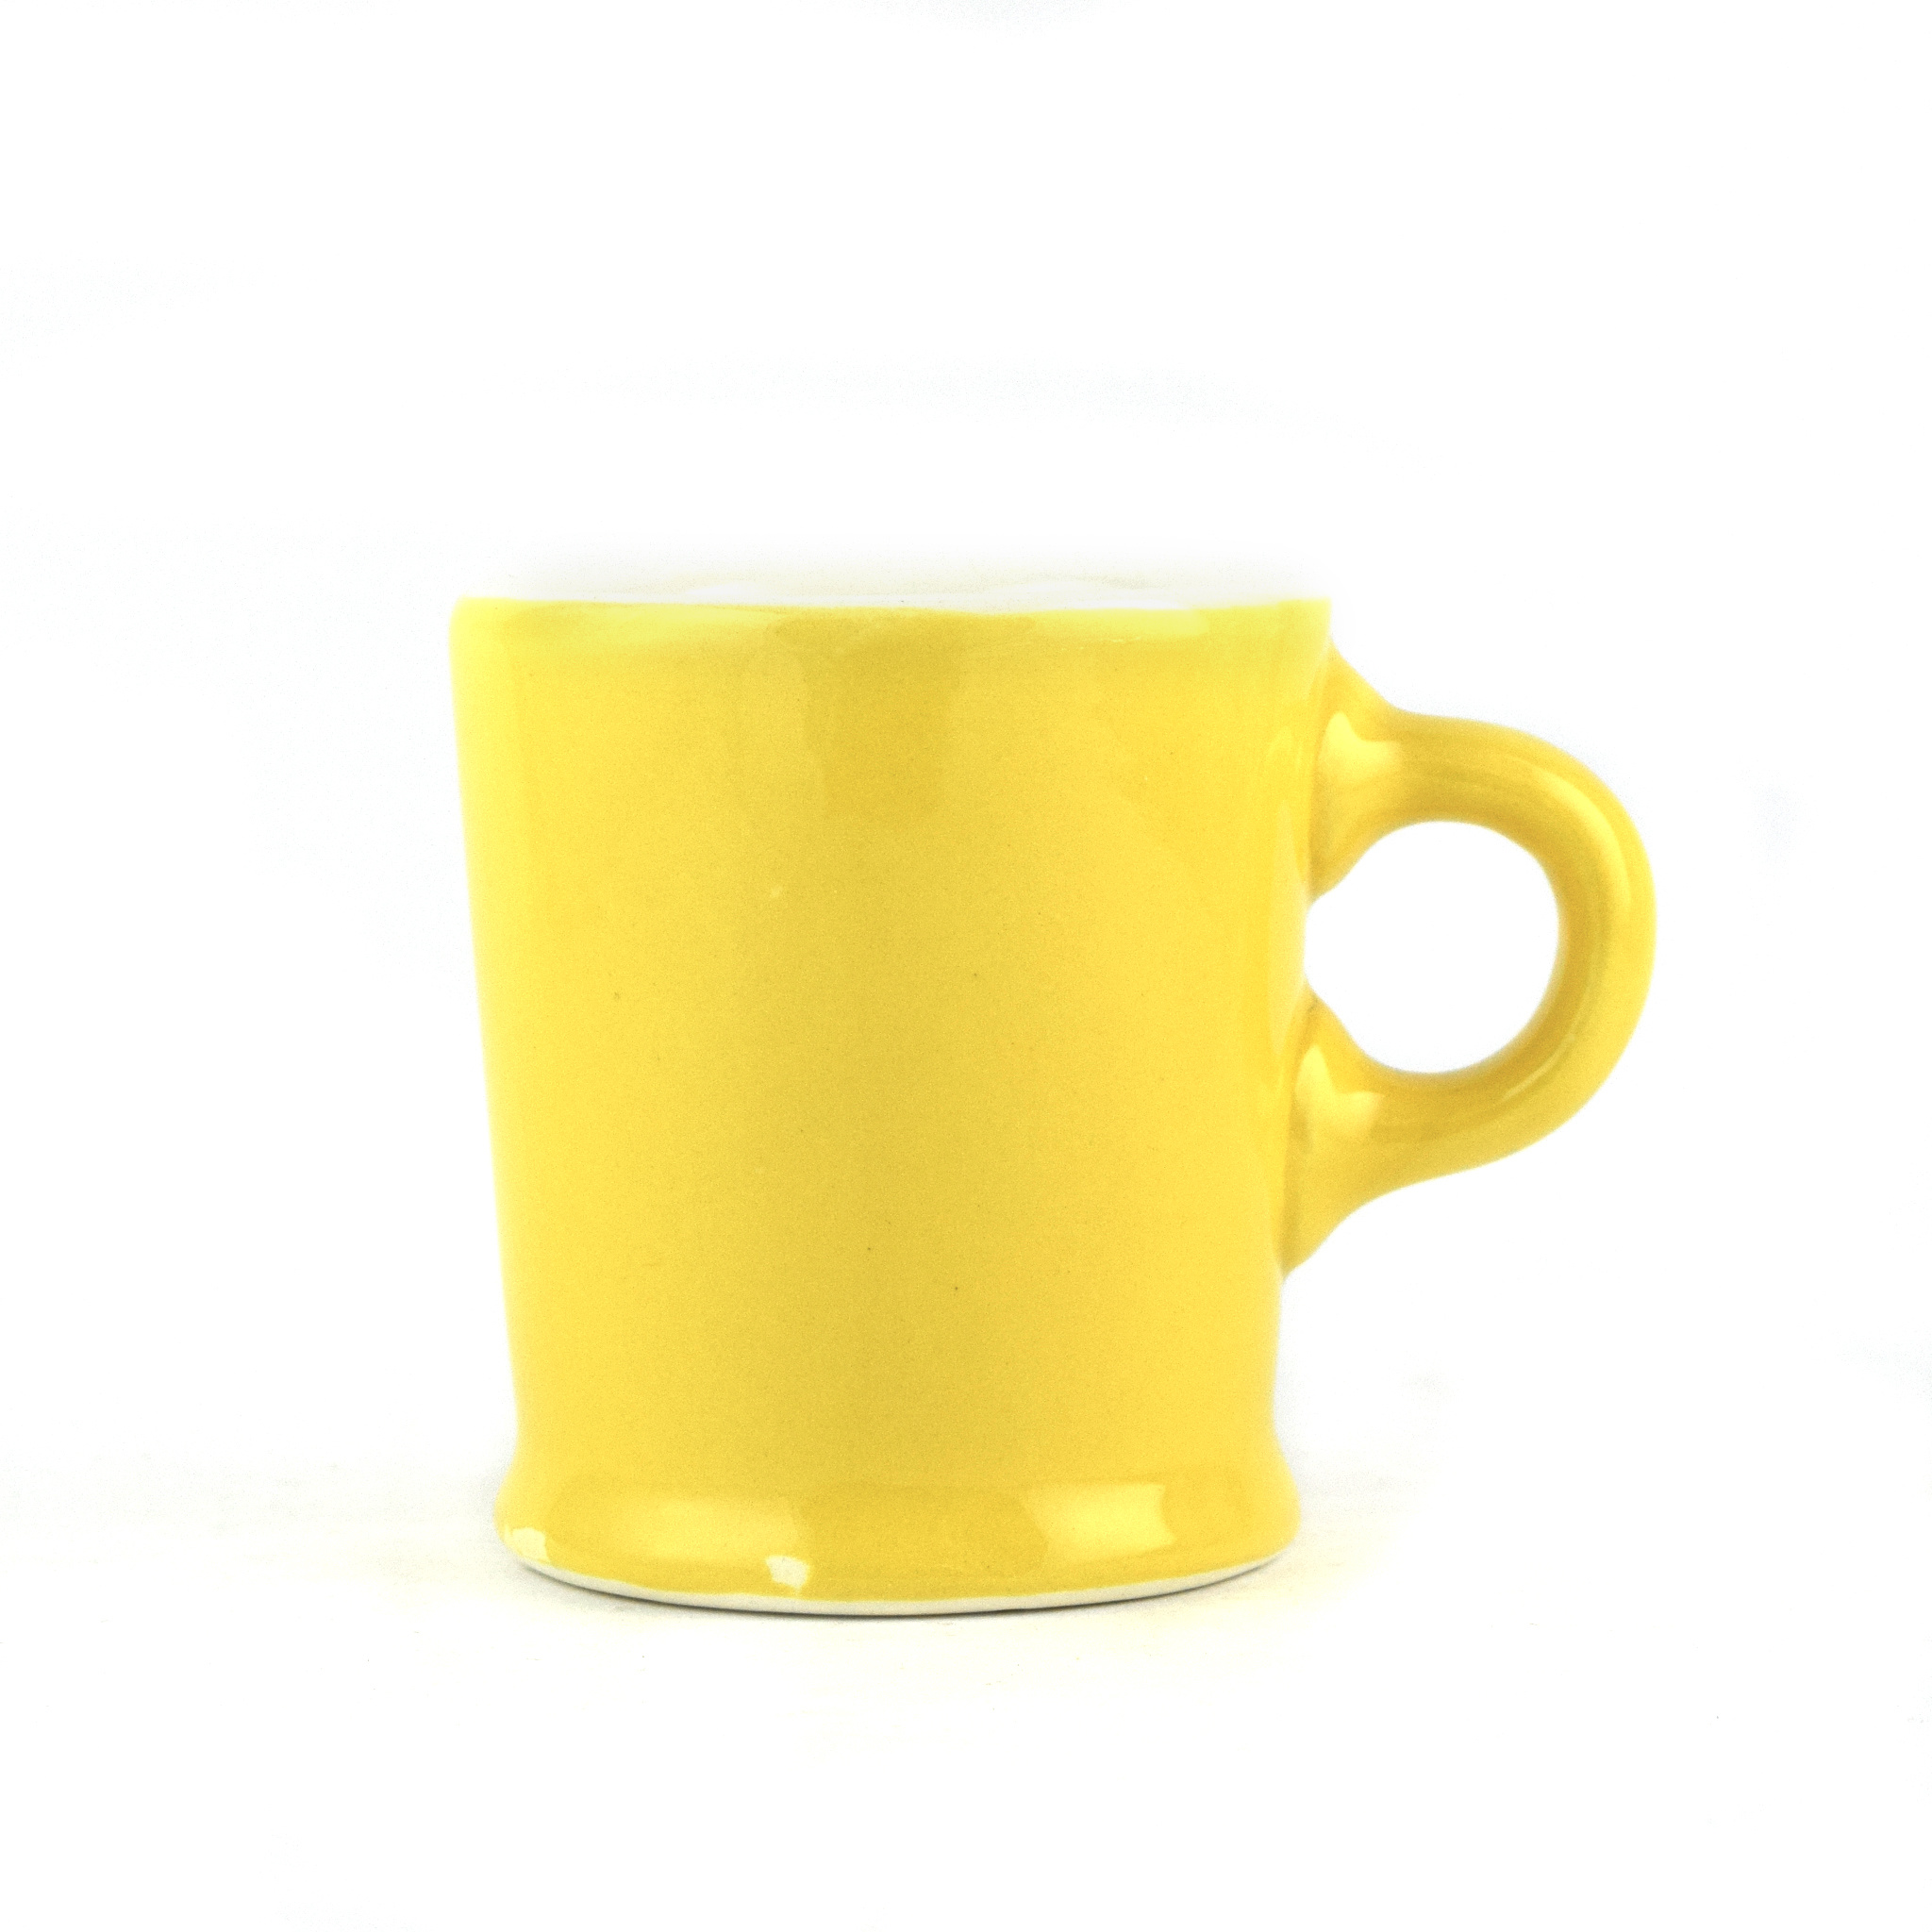 Hycroft Mugs